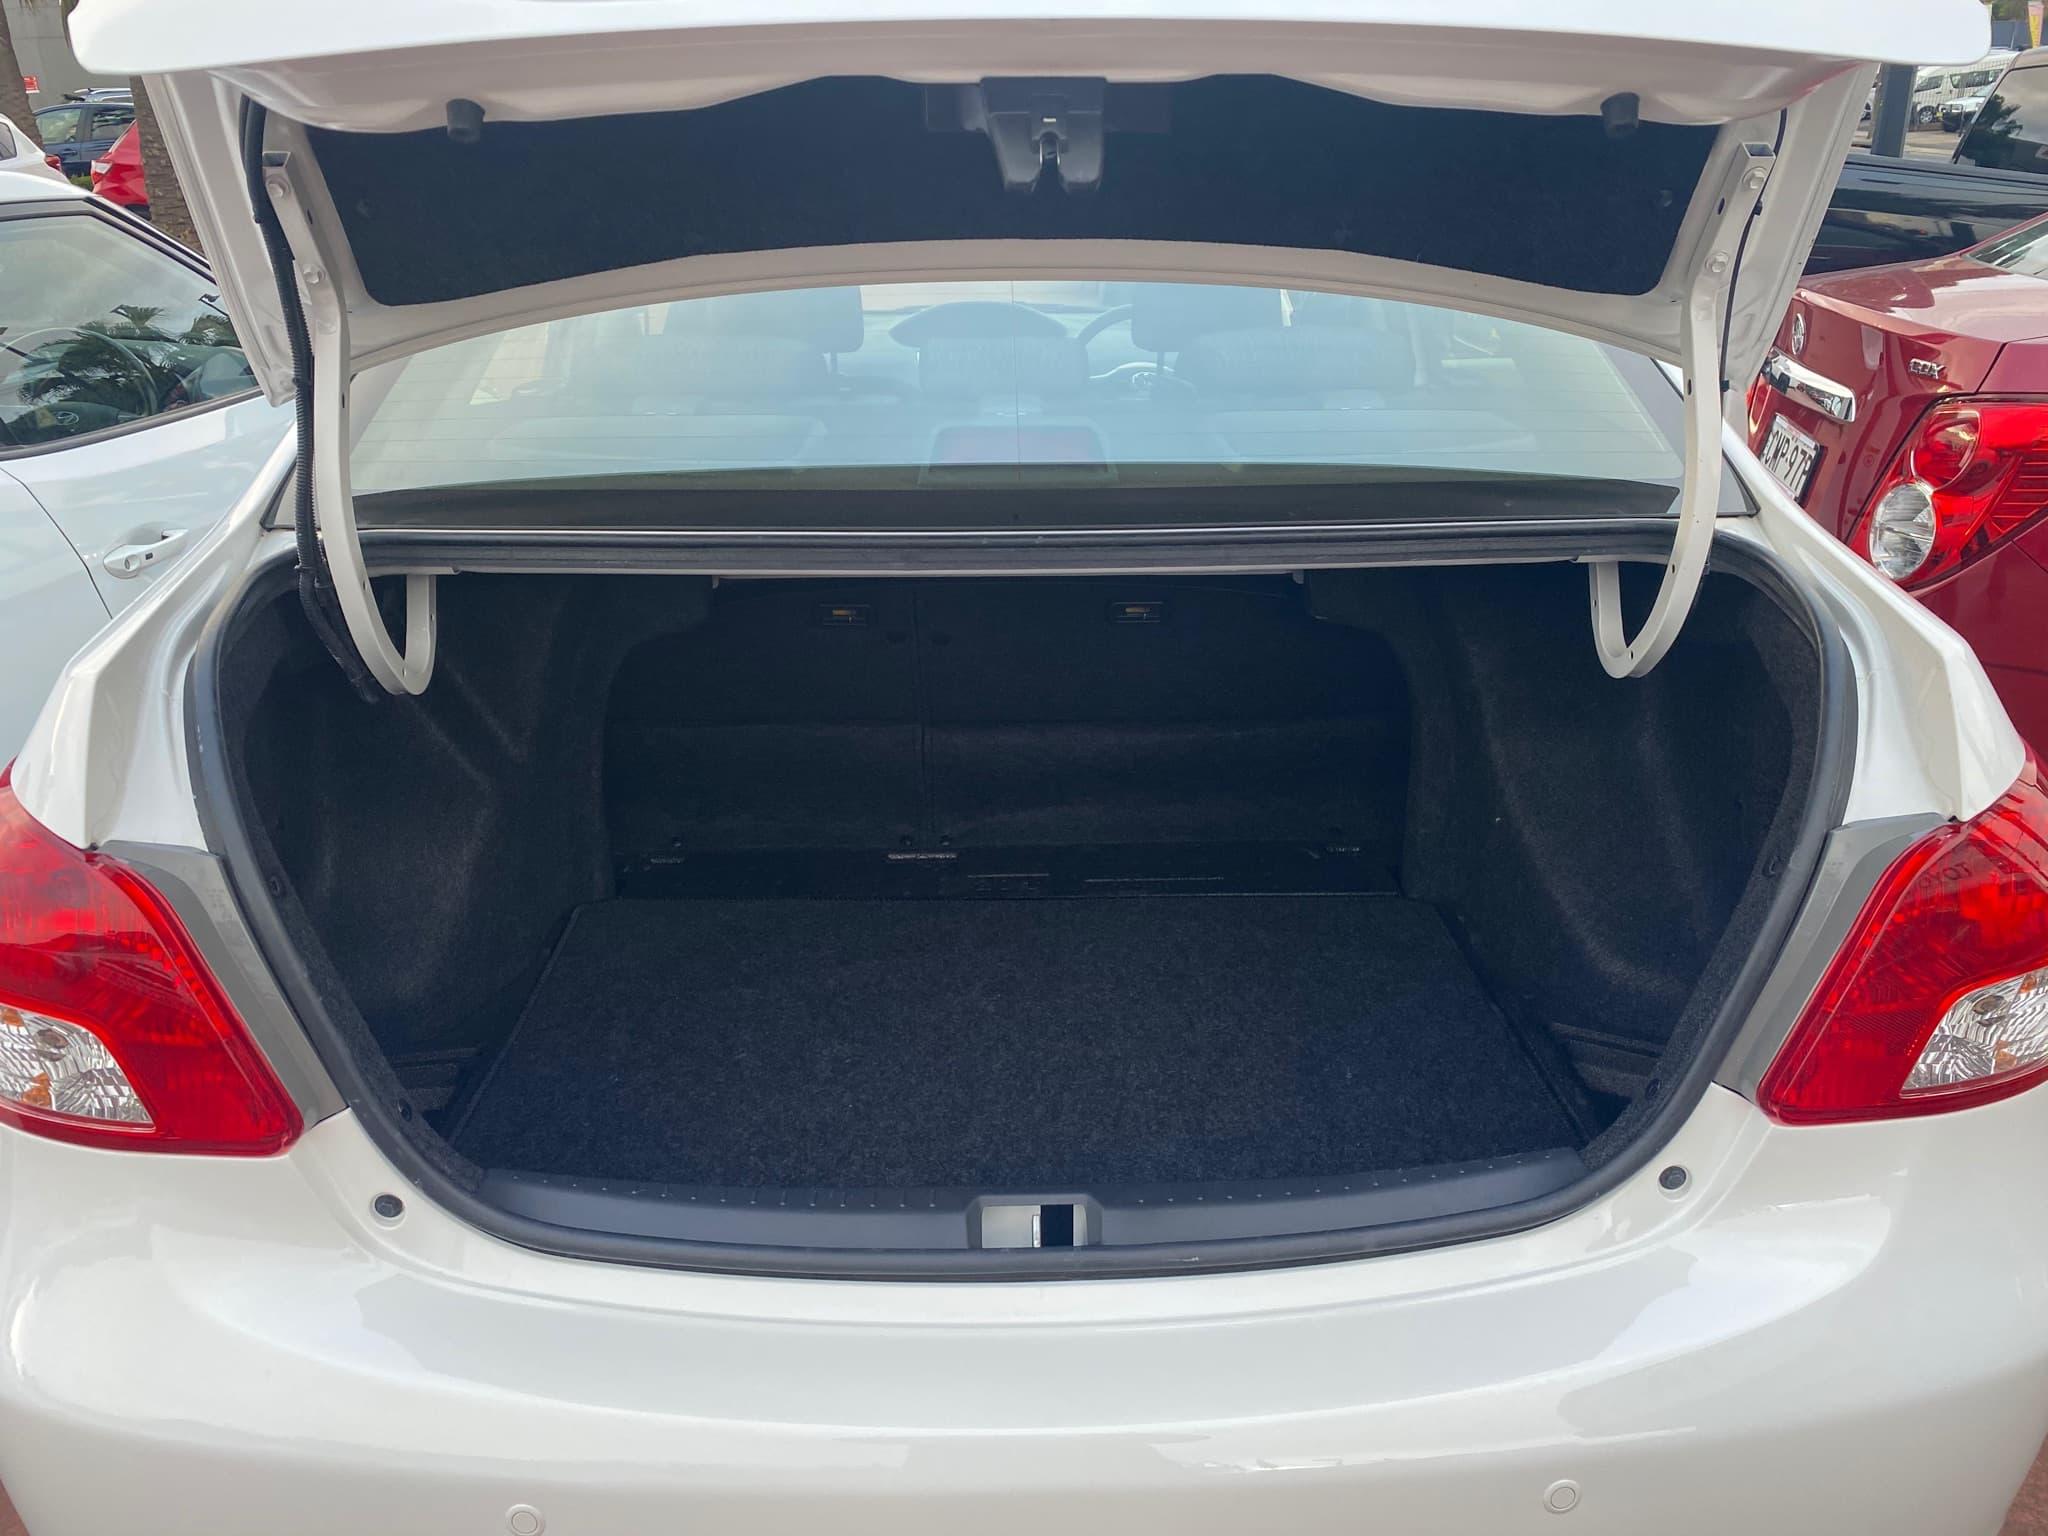 2016 Toyota Yaris YRS Auto - image 8